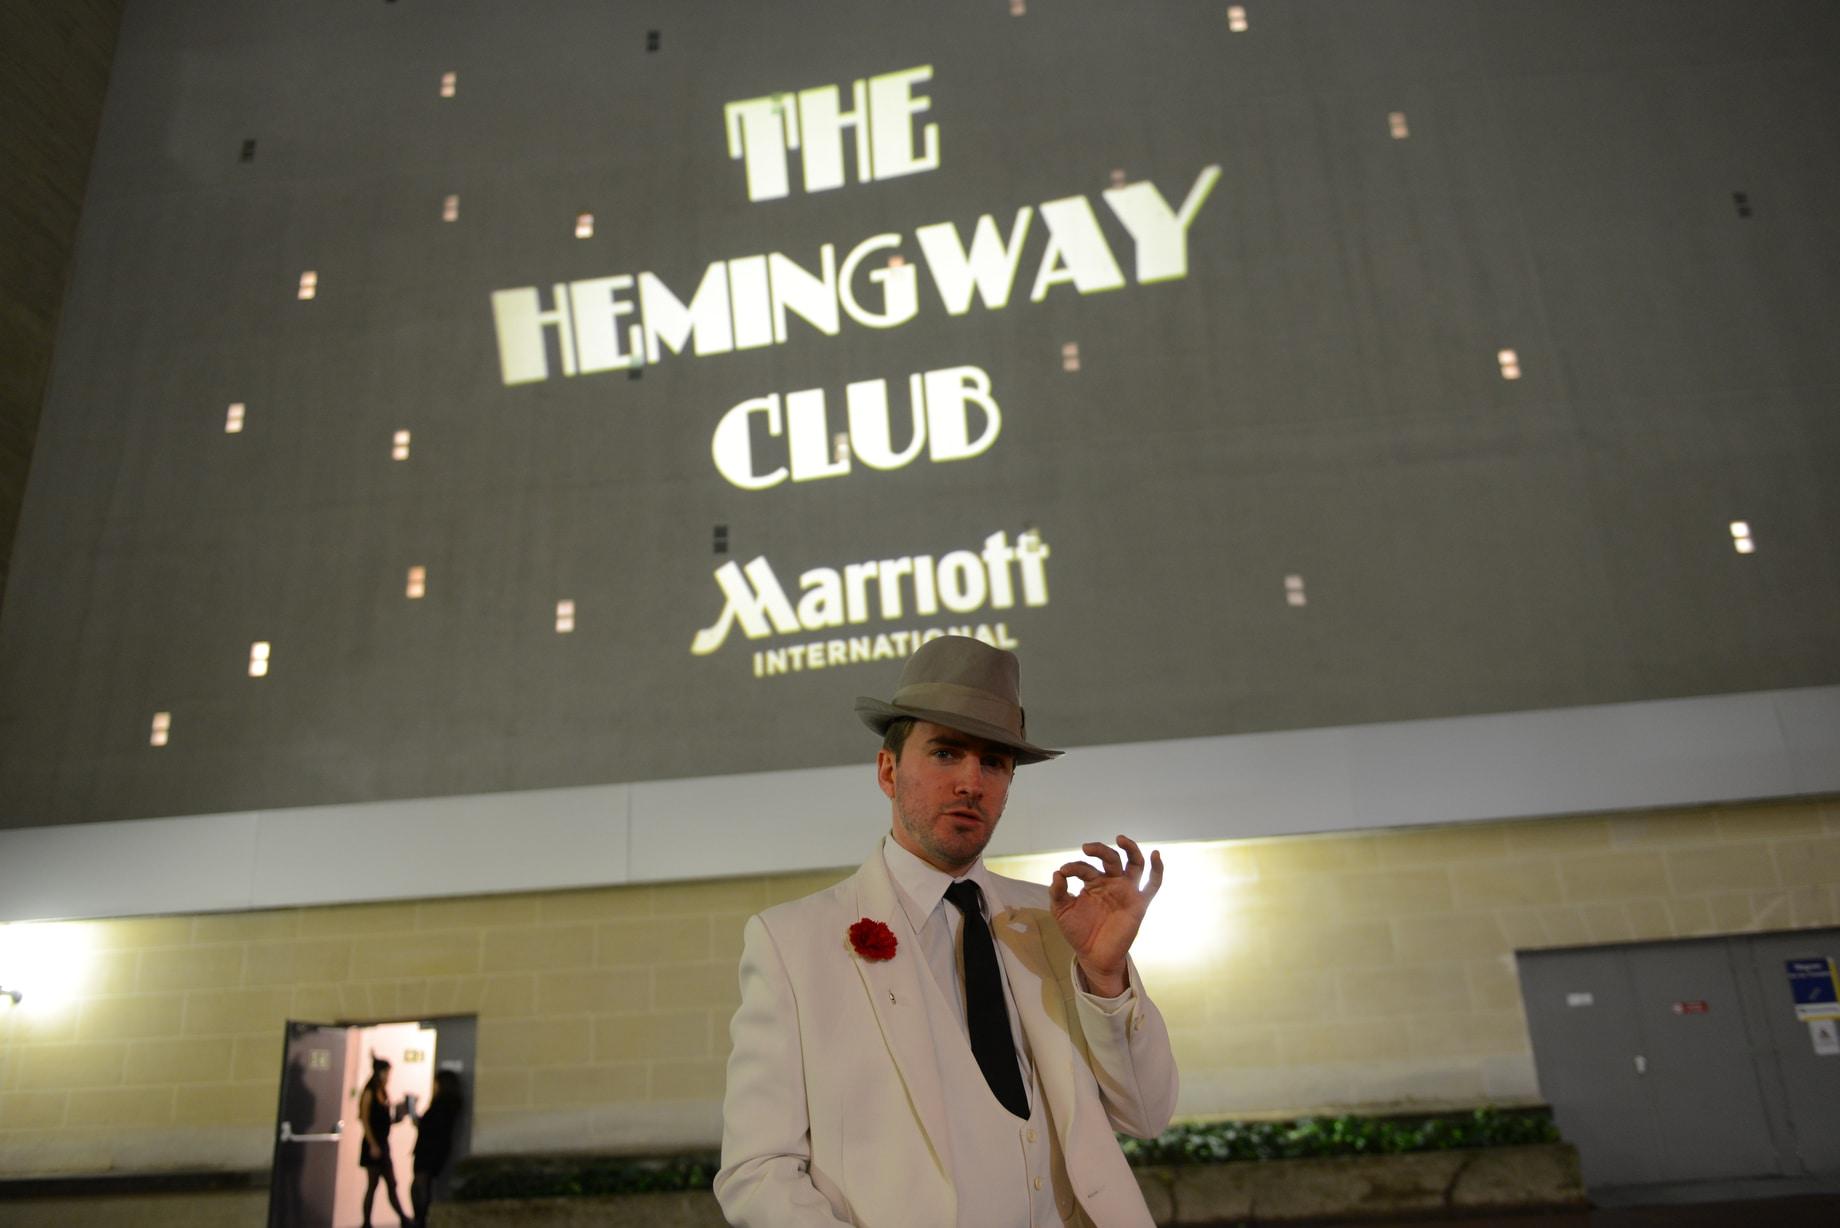 Marriott International: The Hemingway Club